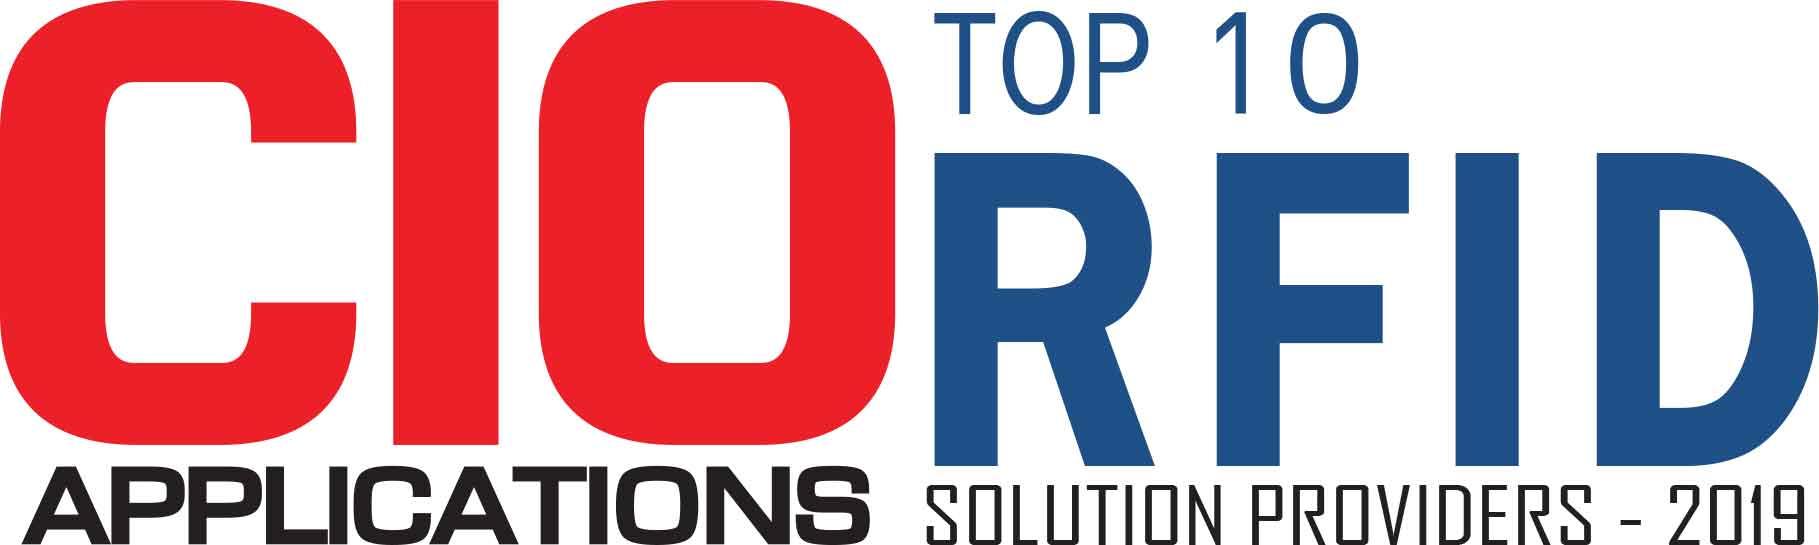 Top 10 RFID Solution Companies - 2019